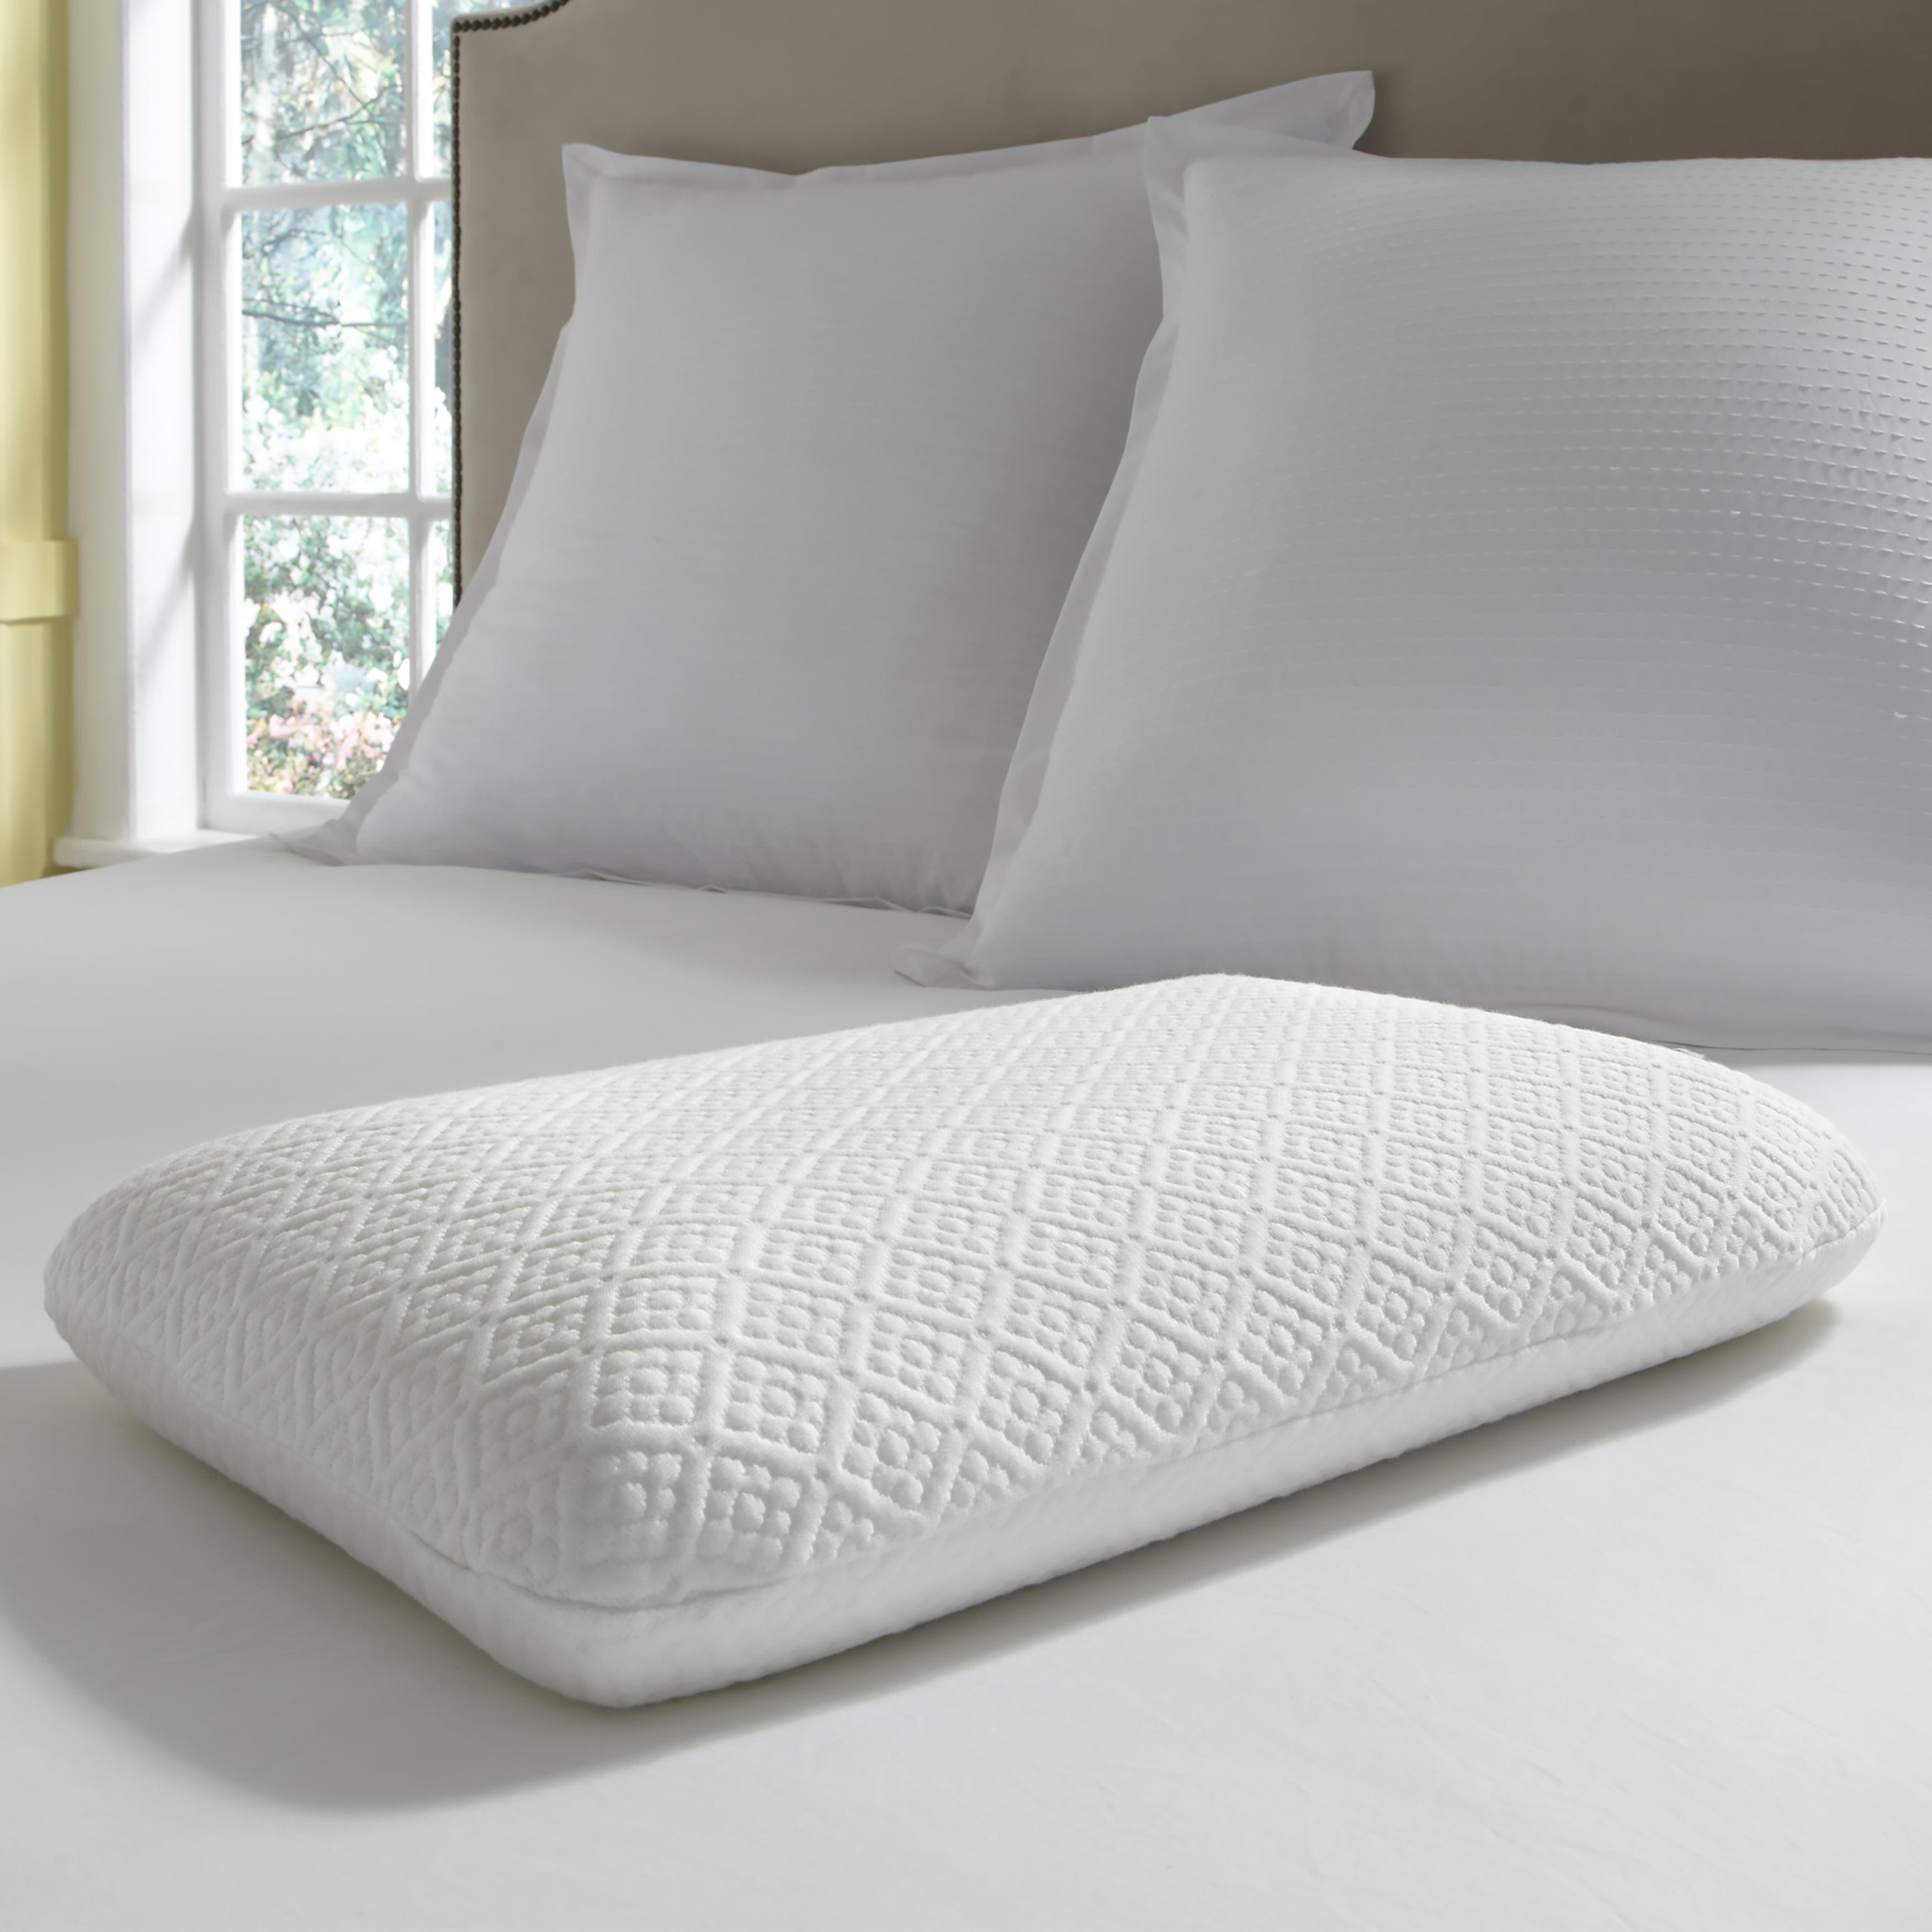 Rio Home Fashions Tradition Memory Foam Pillow